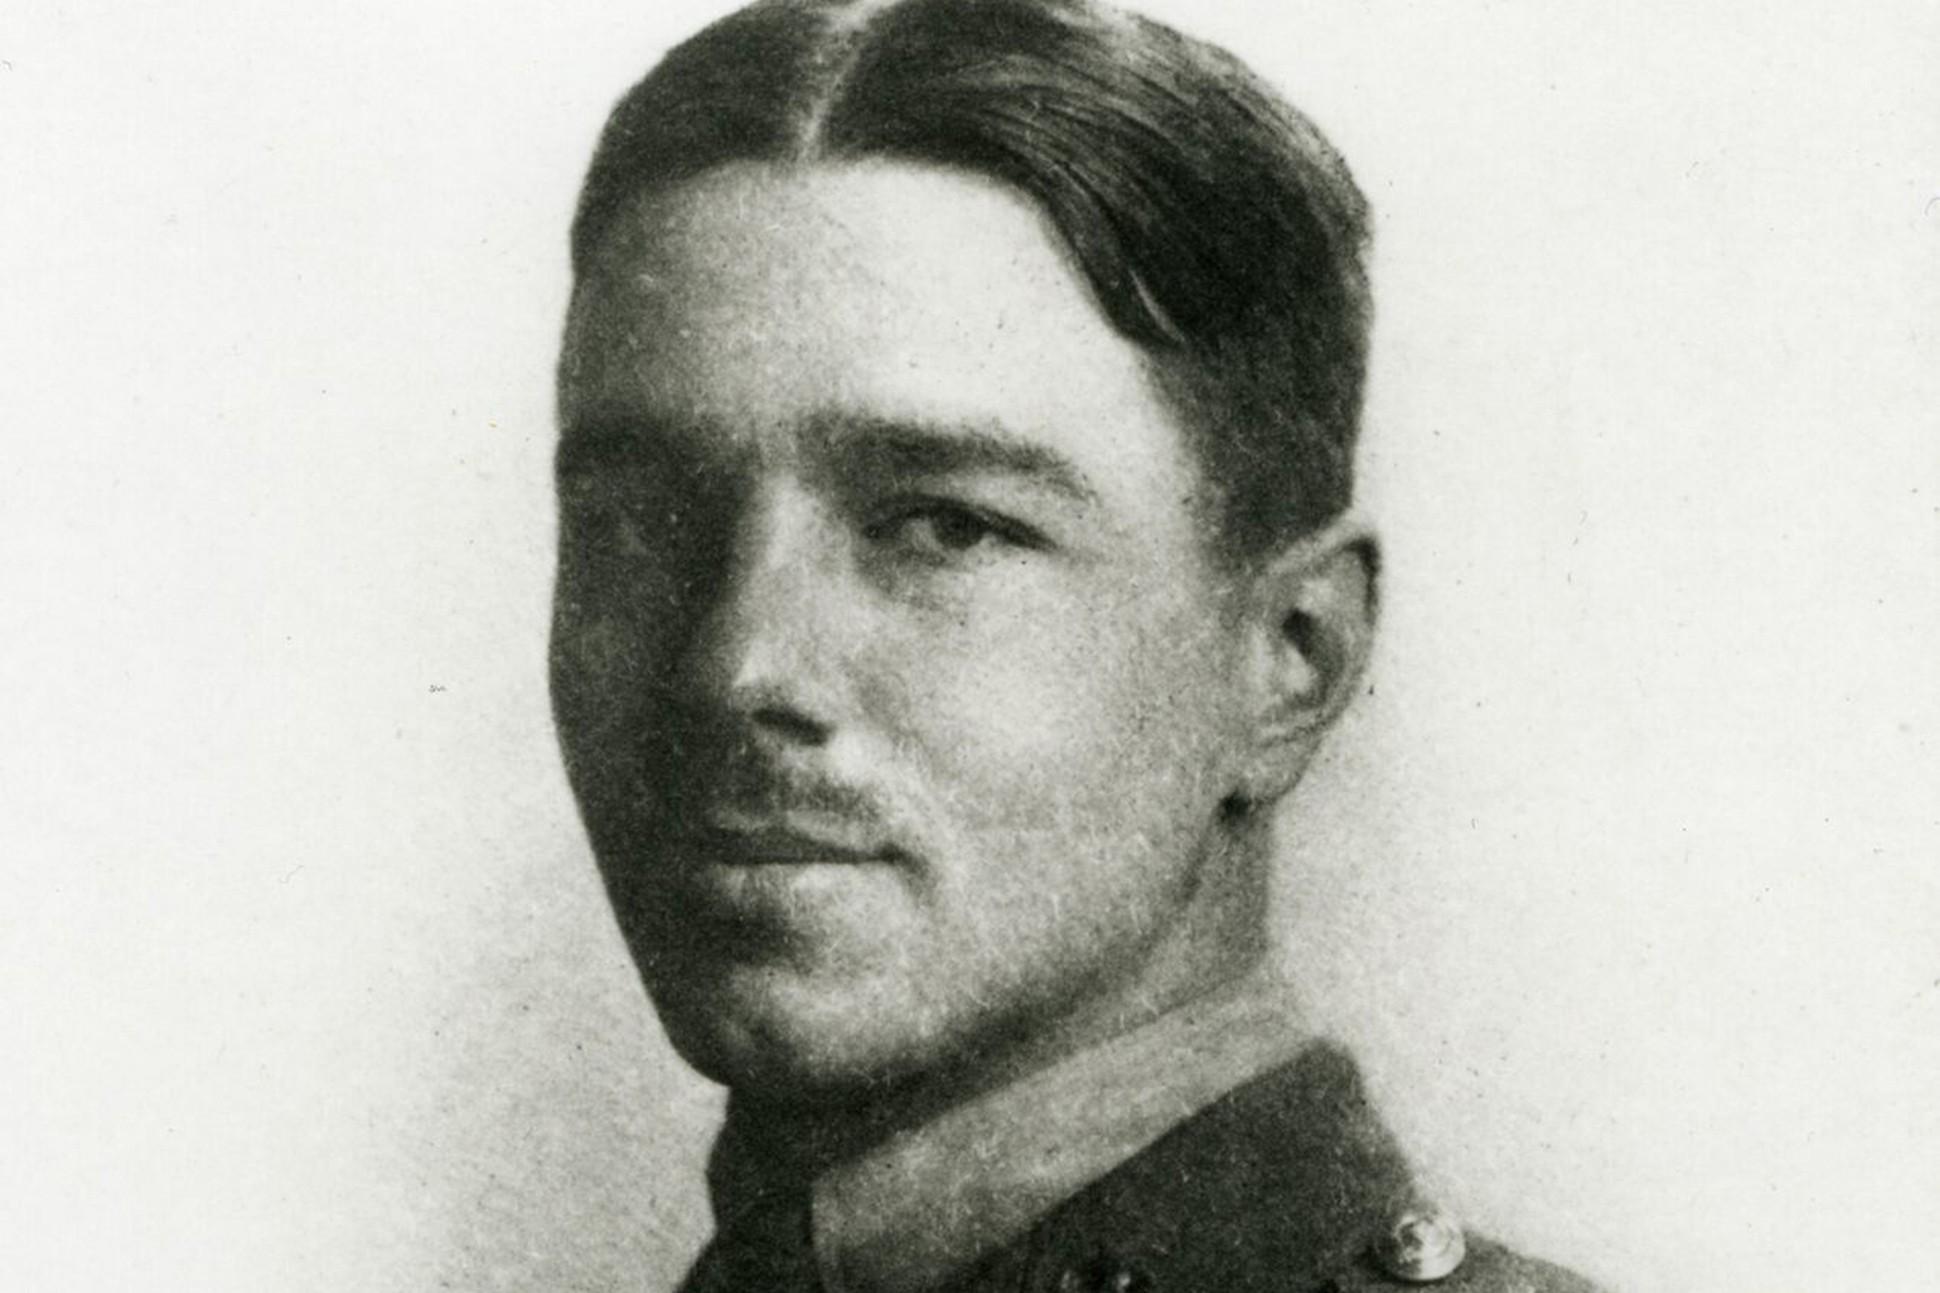 Image of Wilfred Owen.